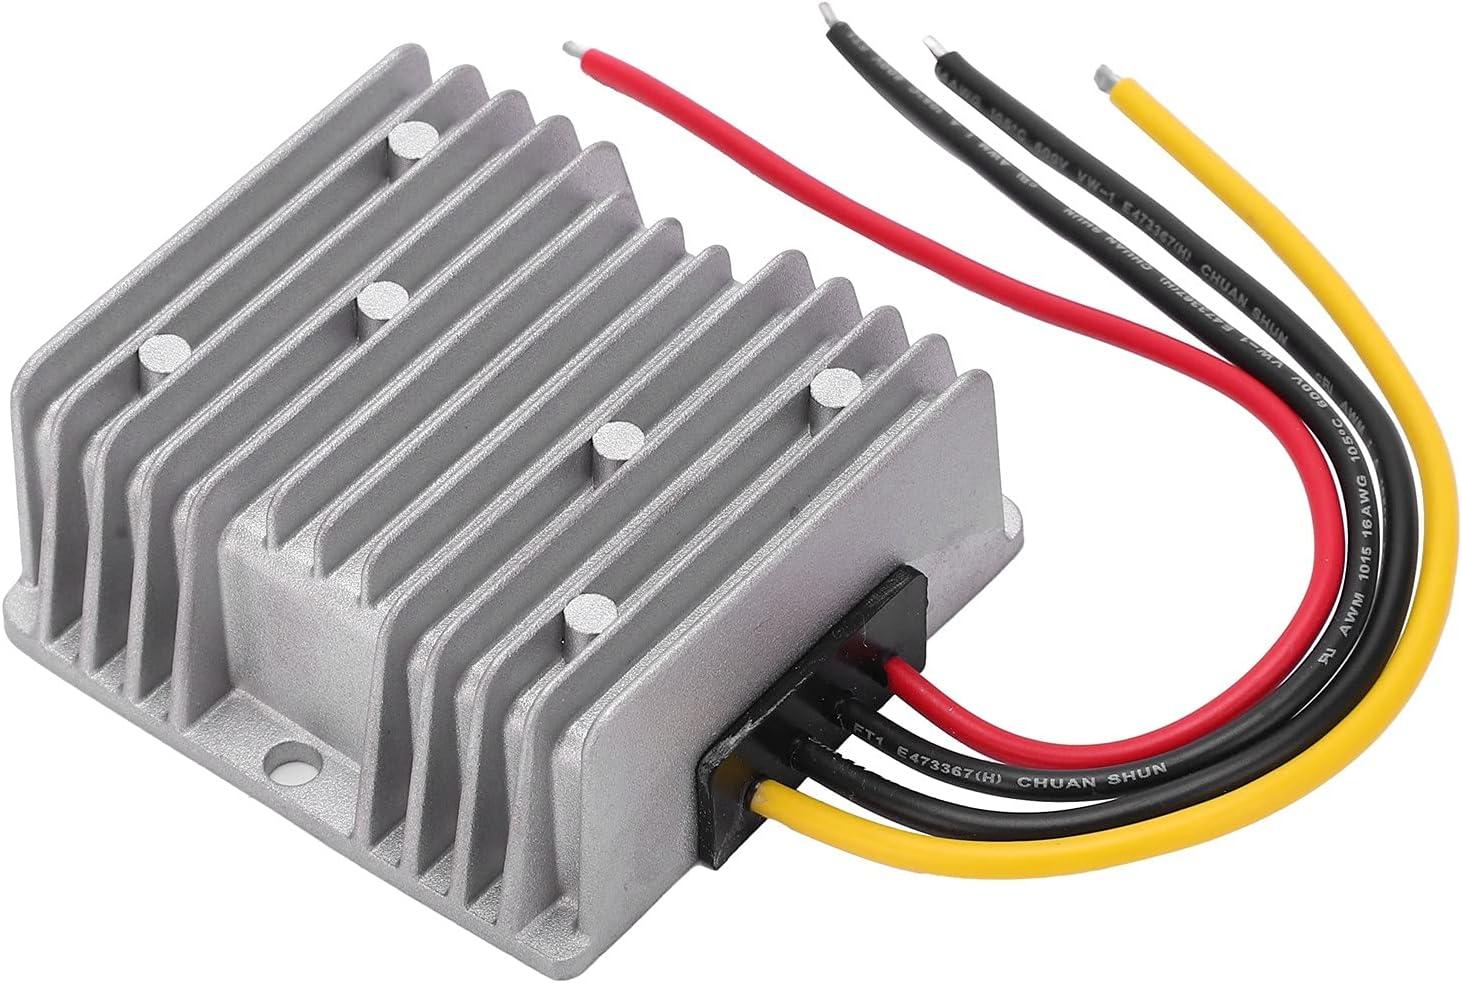 Eujgoov DC 24V to 12V Power Converter Step Down Power Supply Voltage Regulator Transformer for Motor and LED Light